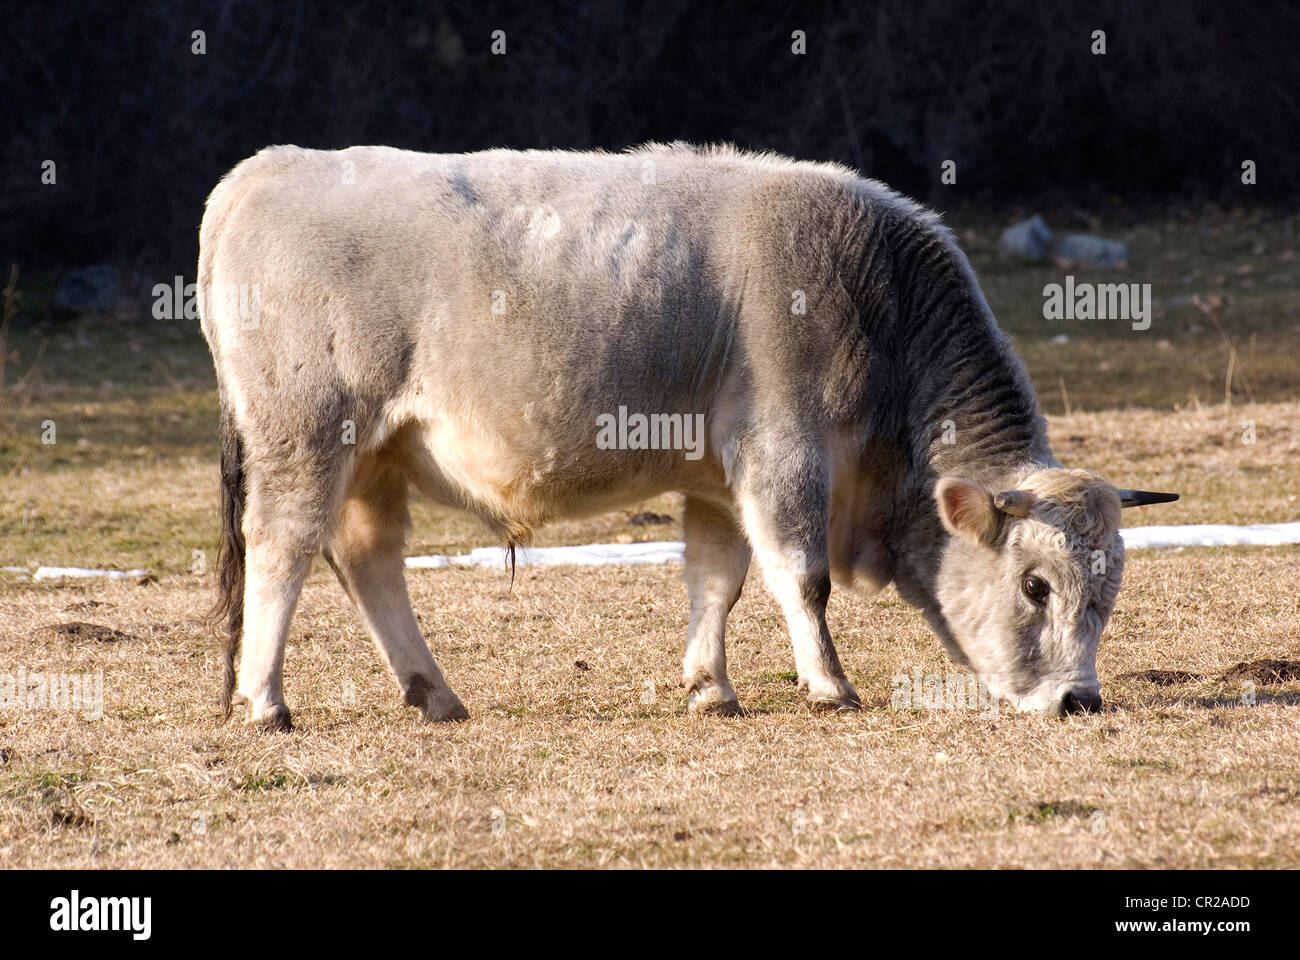 Bull - Stock Image